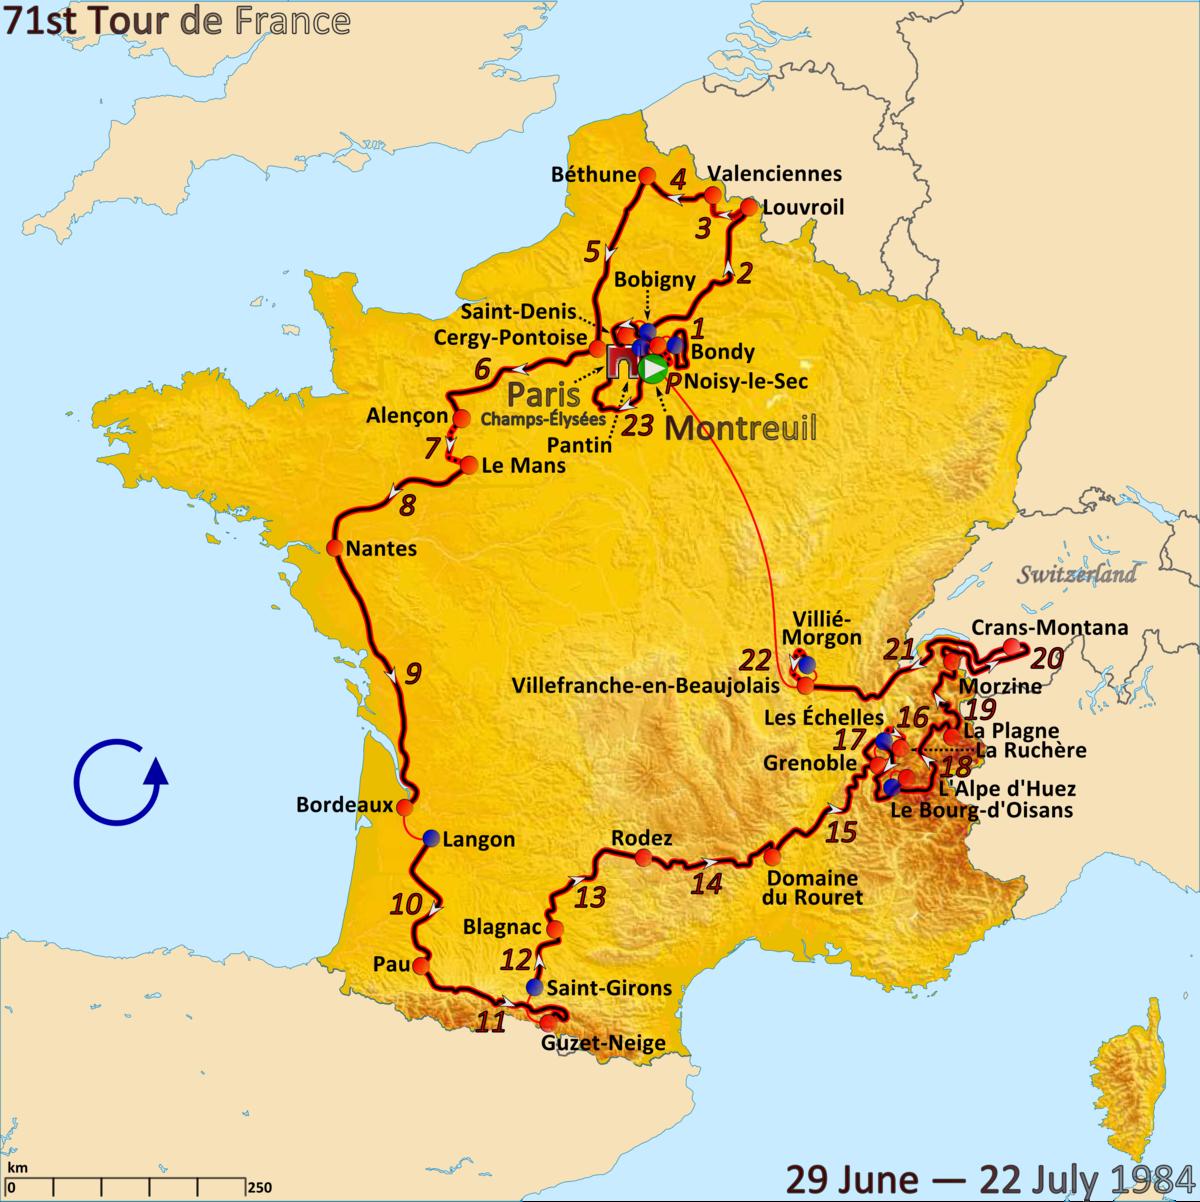 1984 Tour de France - Wikipedia